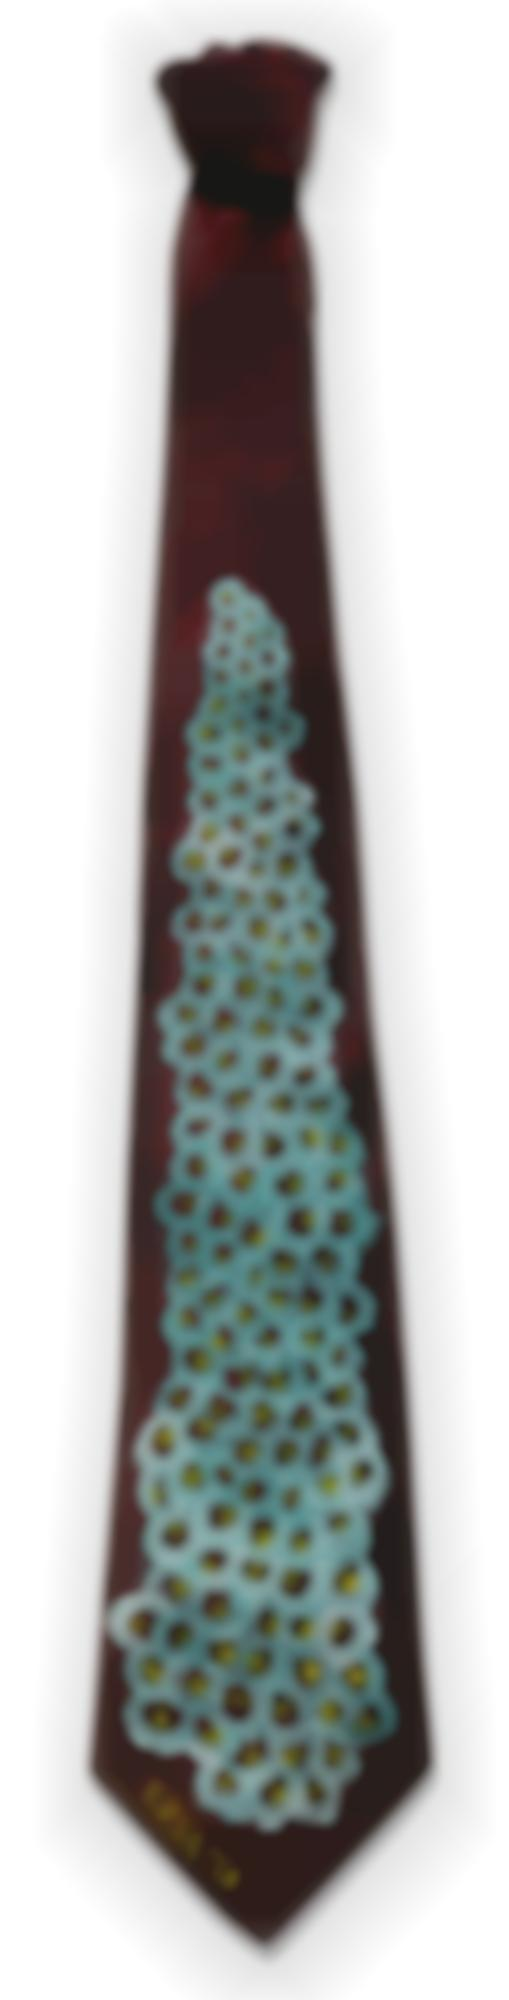 Yayoi Kusama-Untitled (Tie)-1968